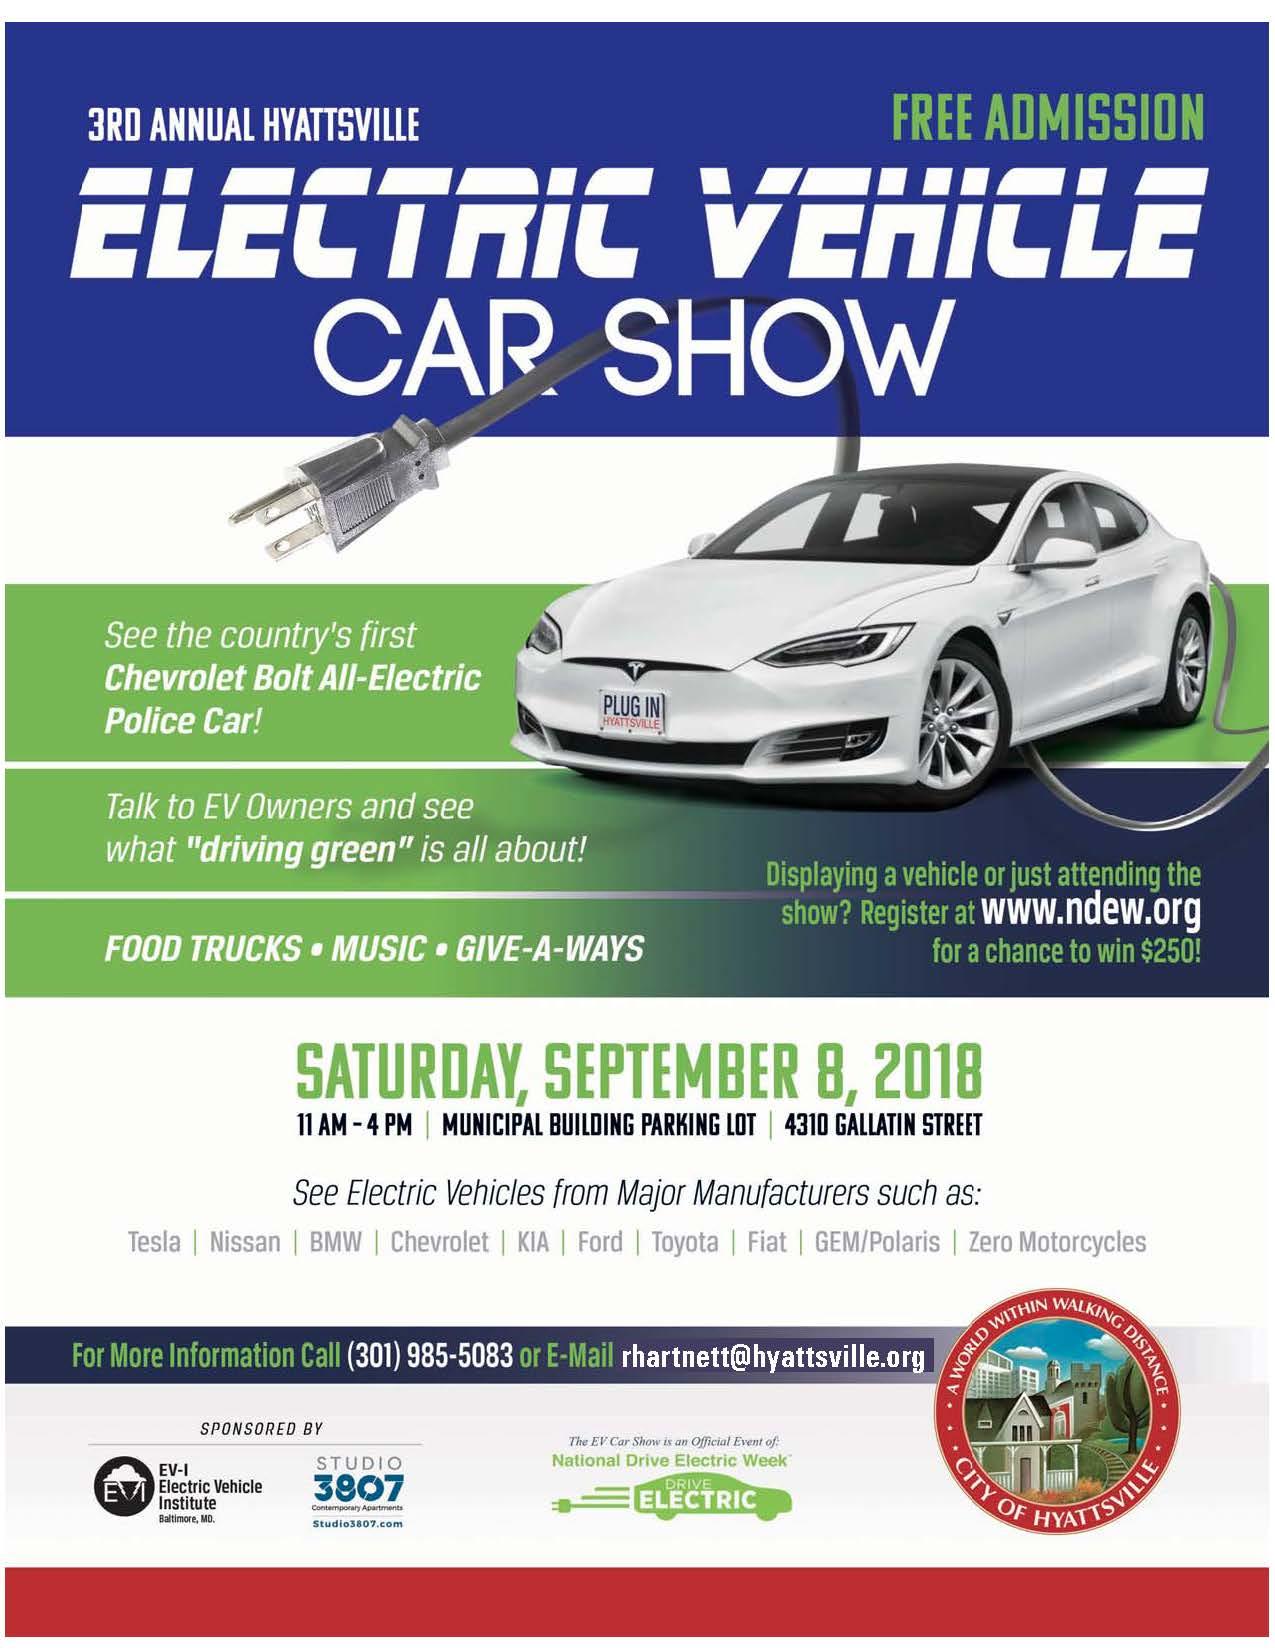 Hyattsvilles 3rd Annual Electric Vehicle Car Show